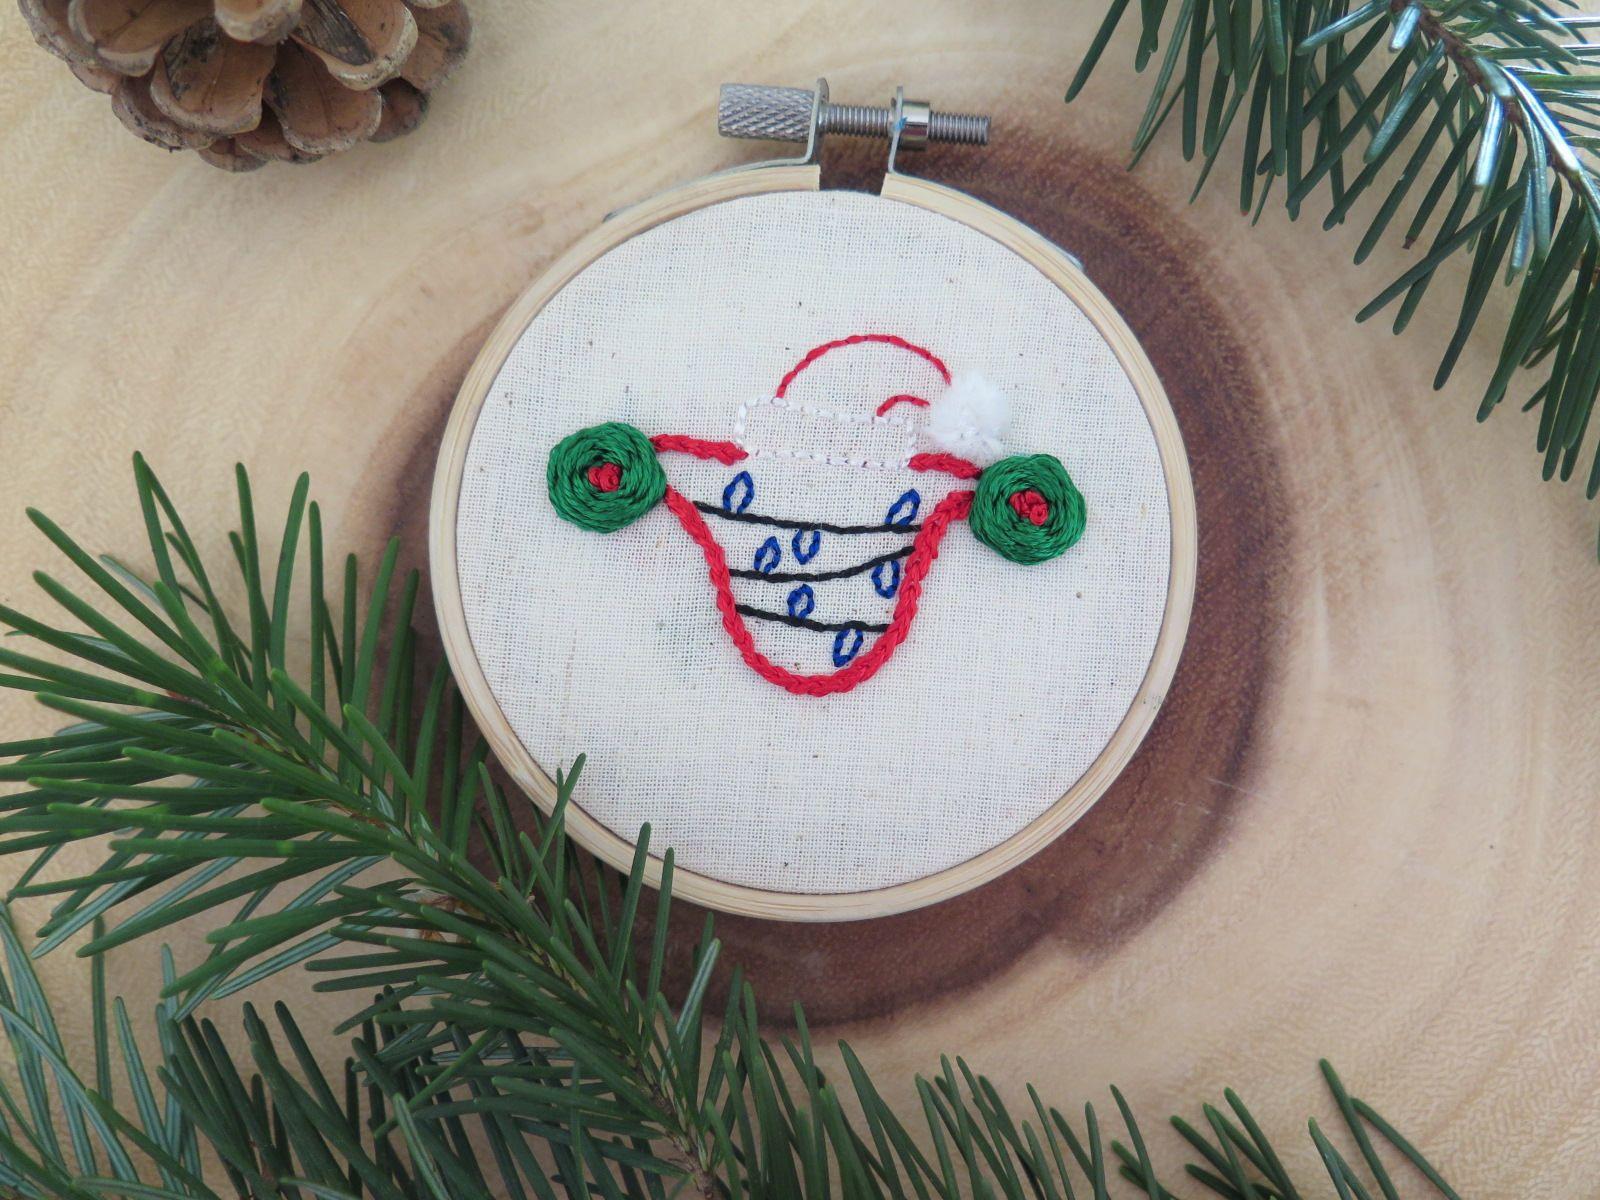 Christmas Uterus Christmas Ornament Feminist Embroidery Hoop Art